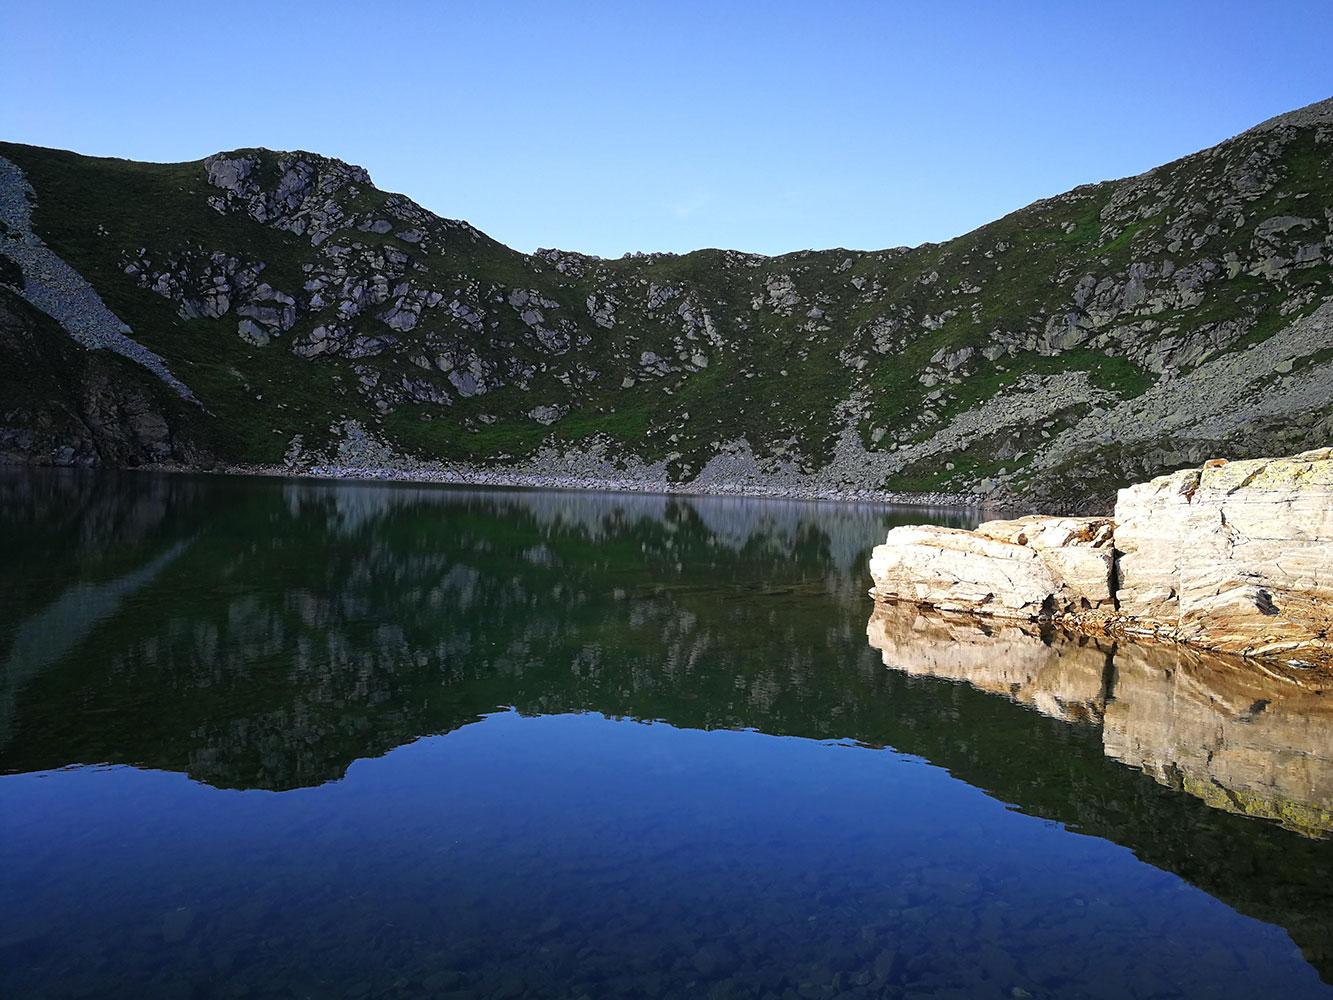 lago-moro-foppolo